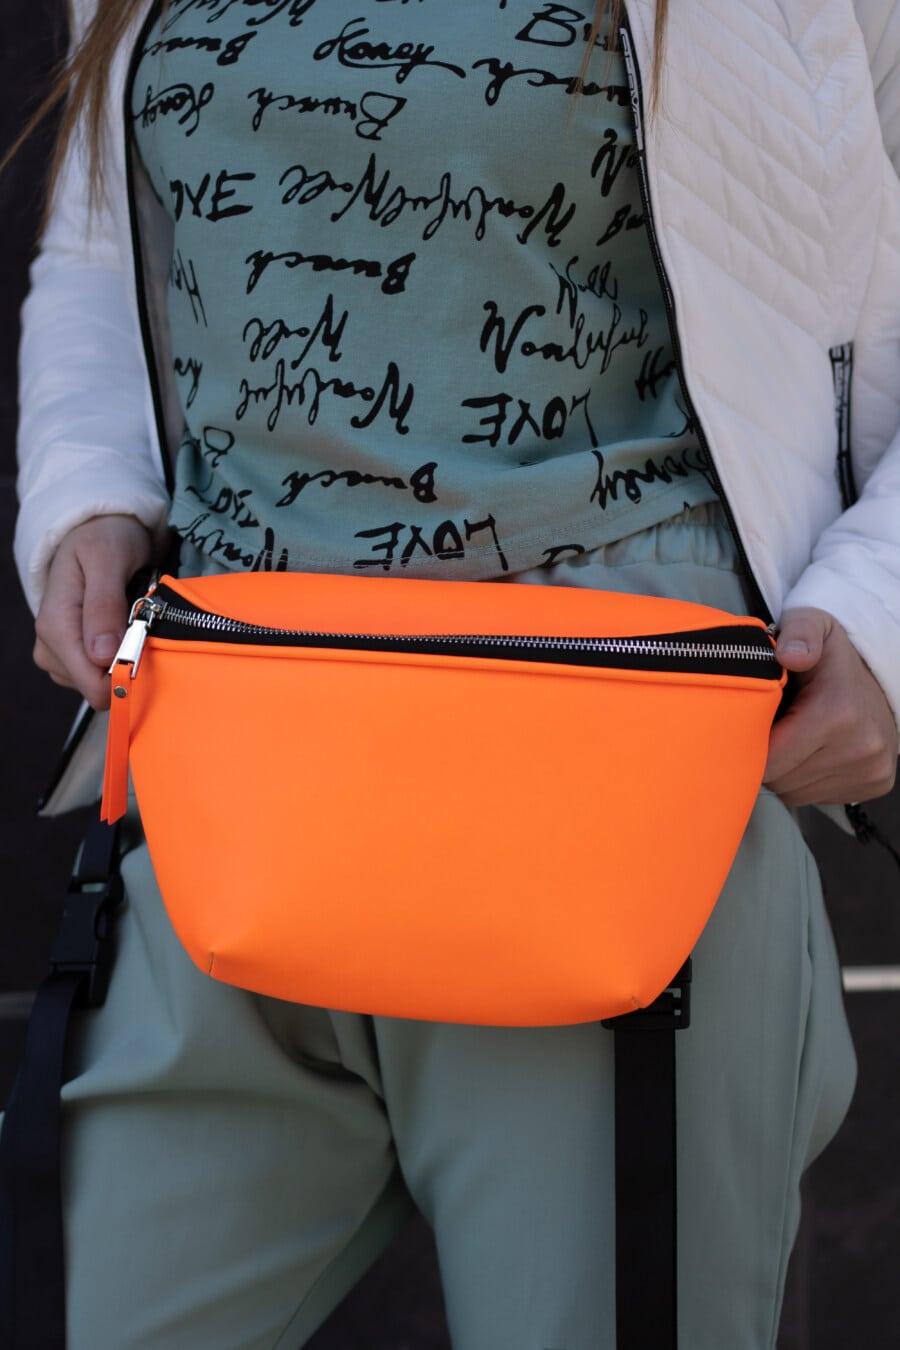 handbag, orange yellow, styling, modern, urban area, young woman, fashion, girl, clothing, holding